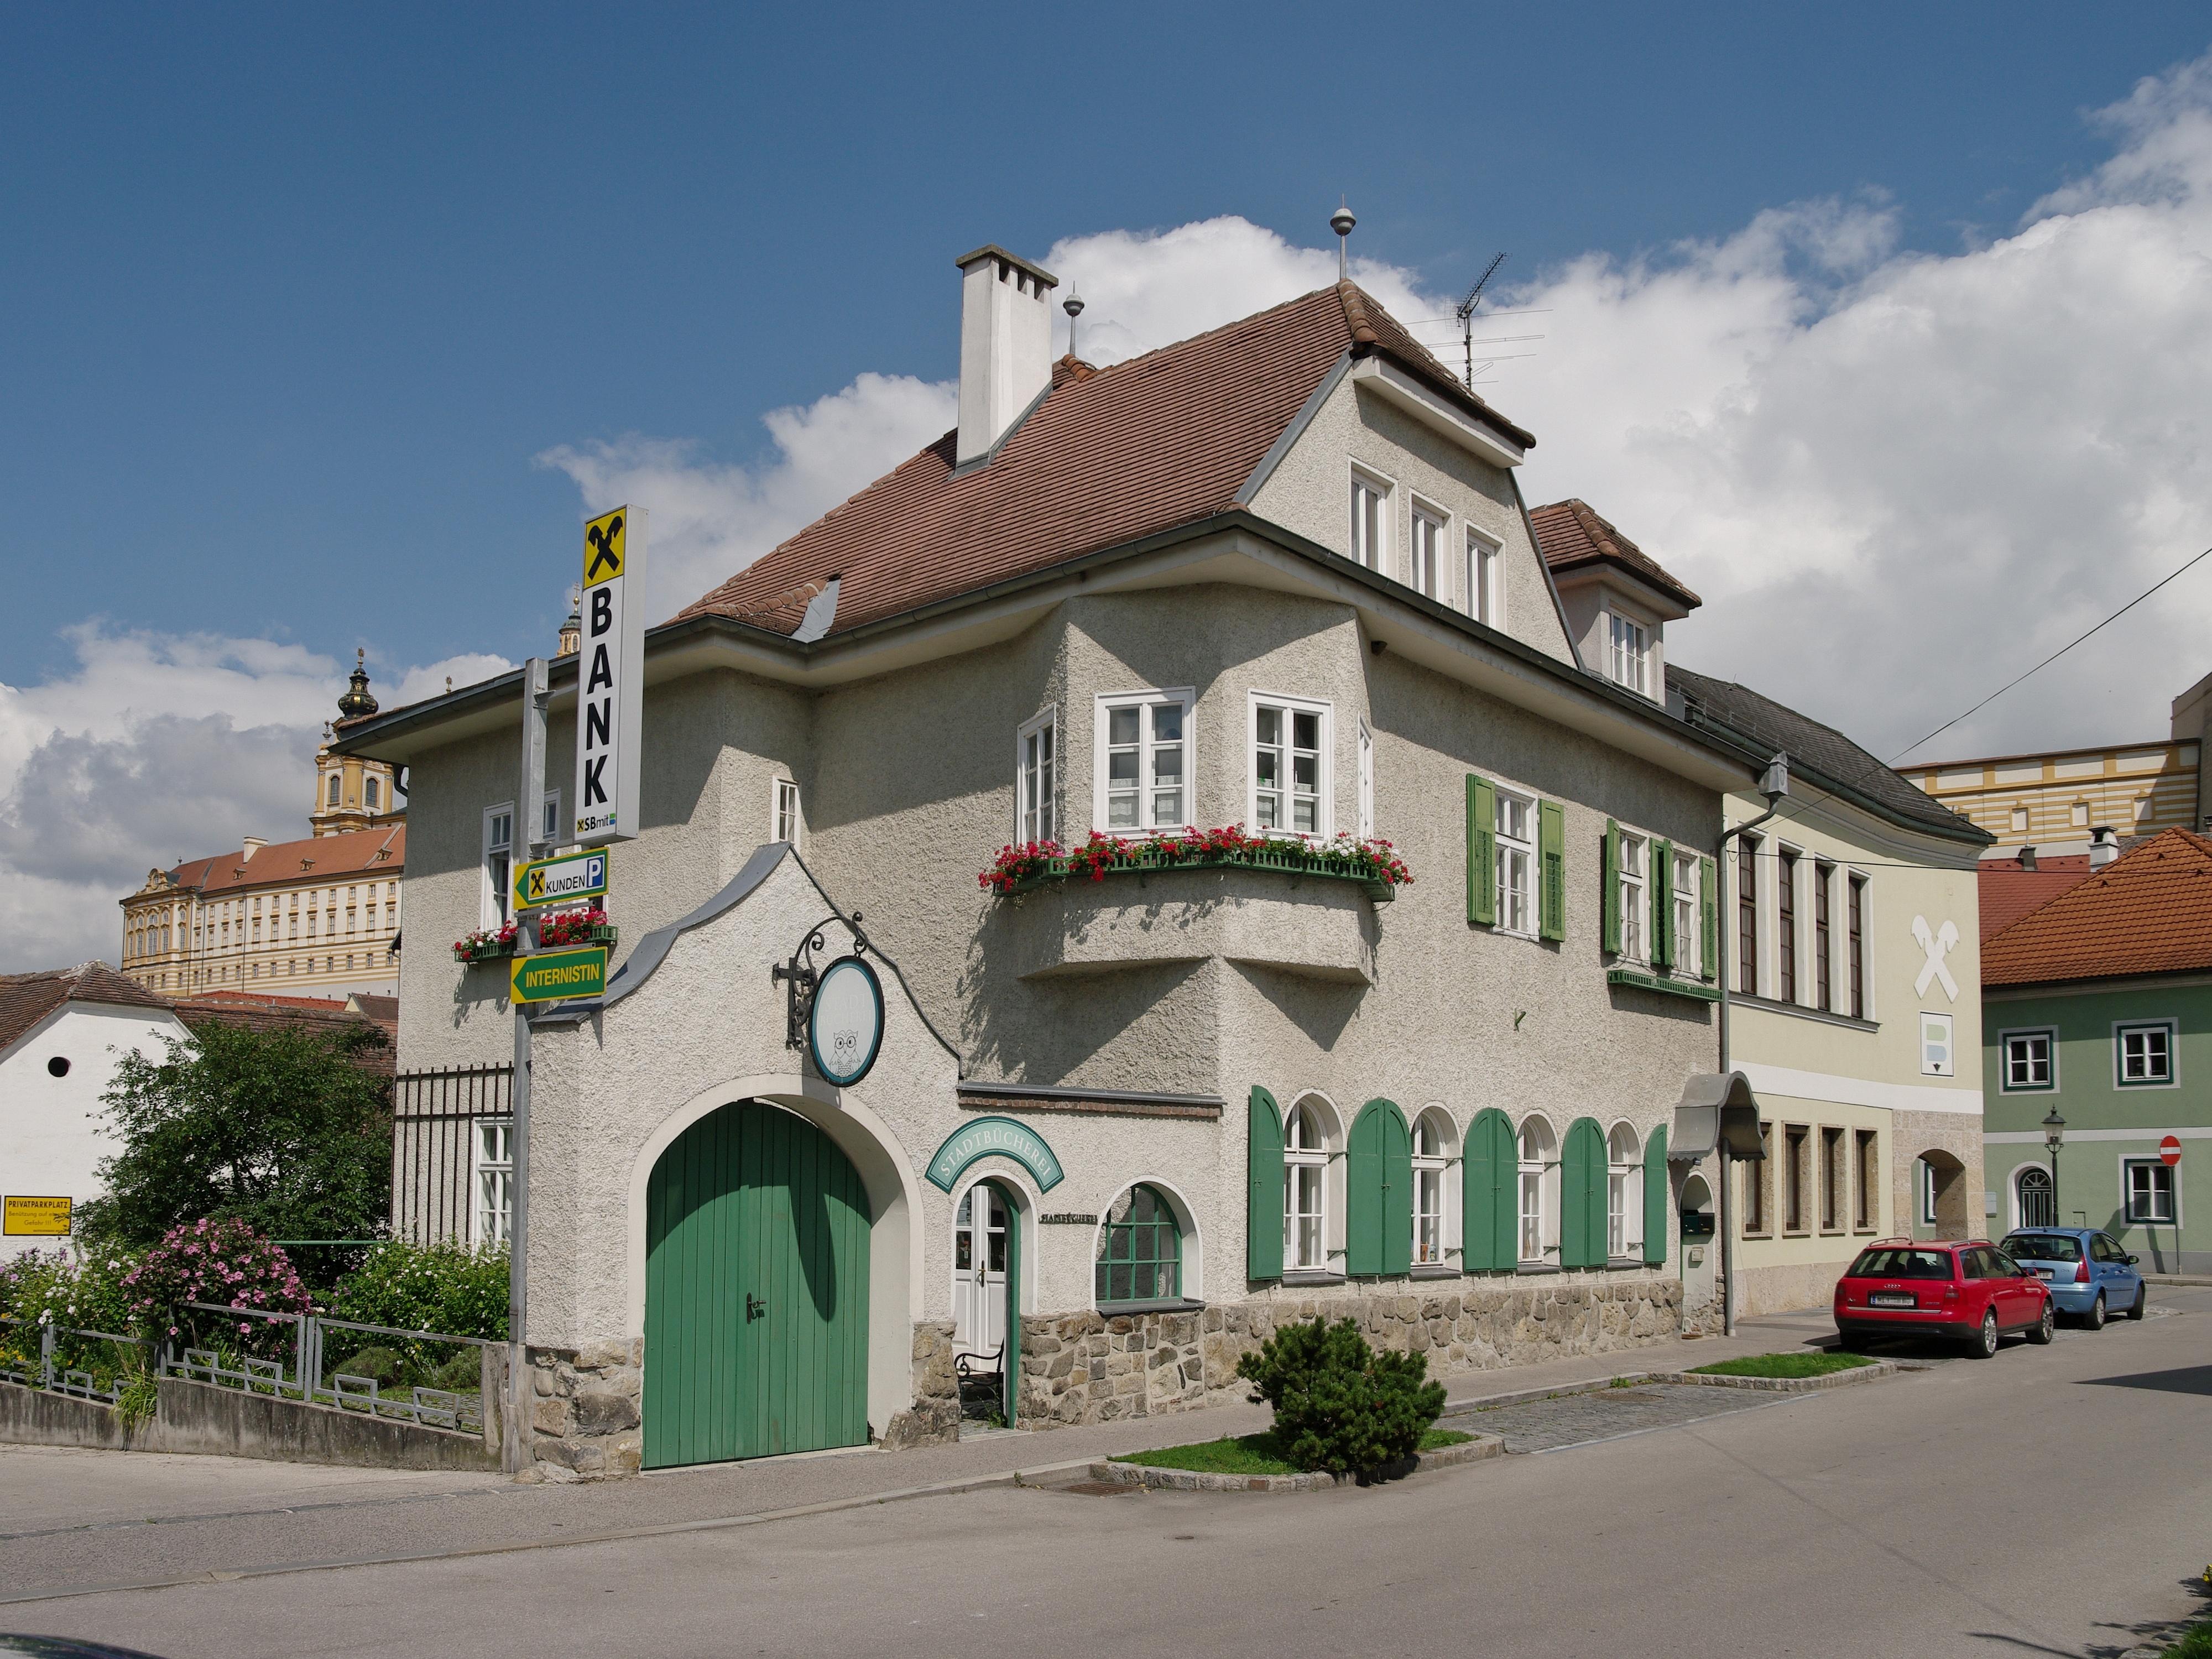 Filemelk Babenbergerstraße 4jpg Wikimedia Commons